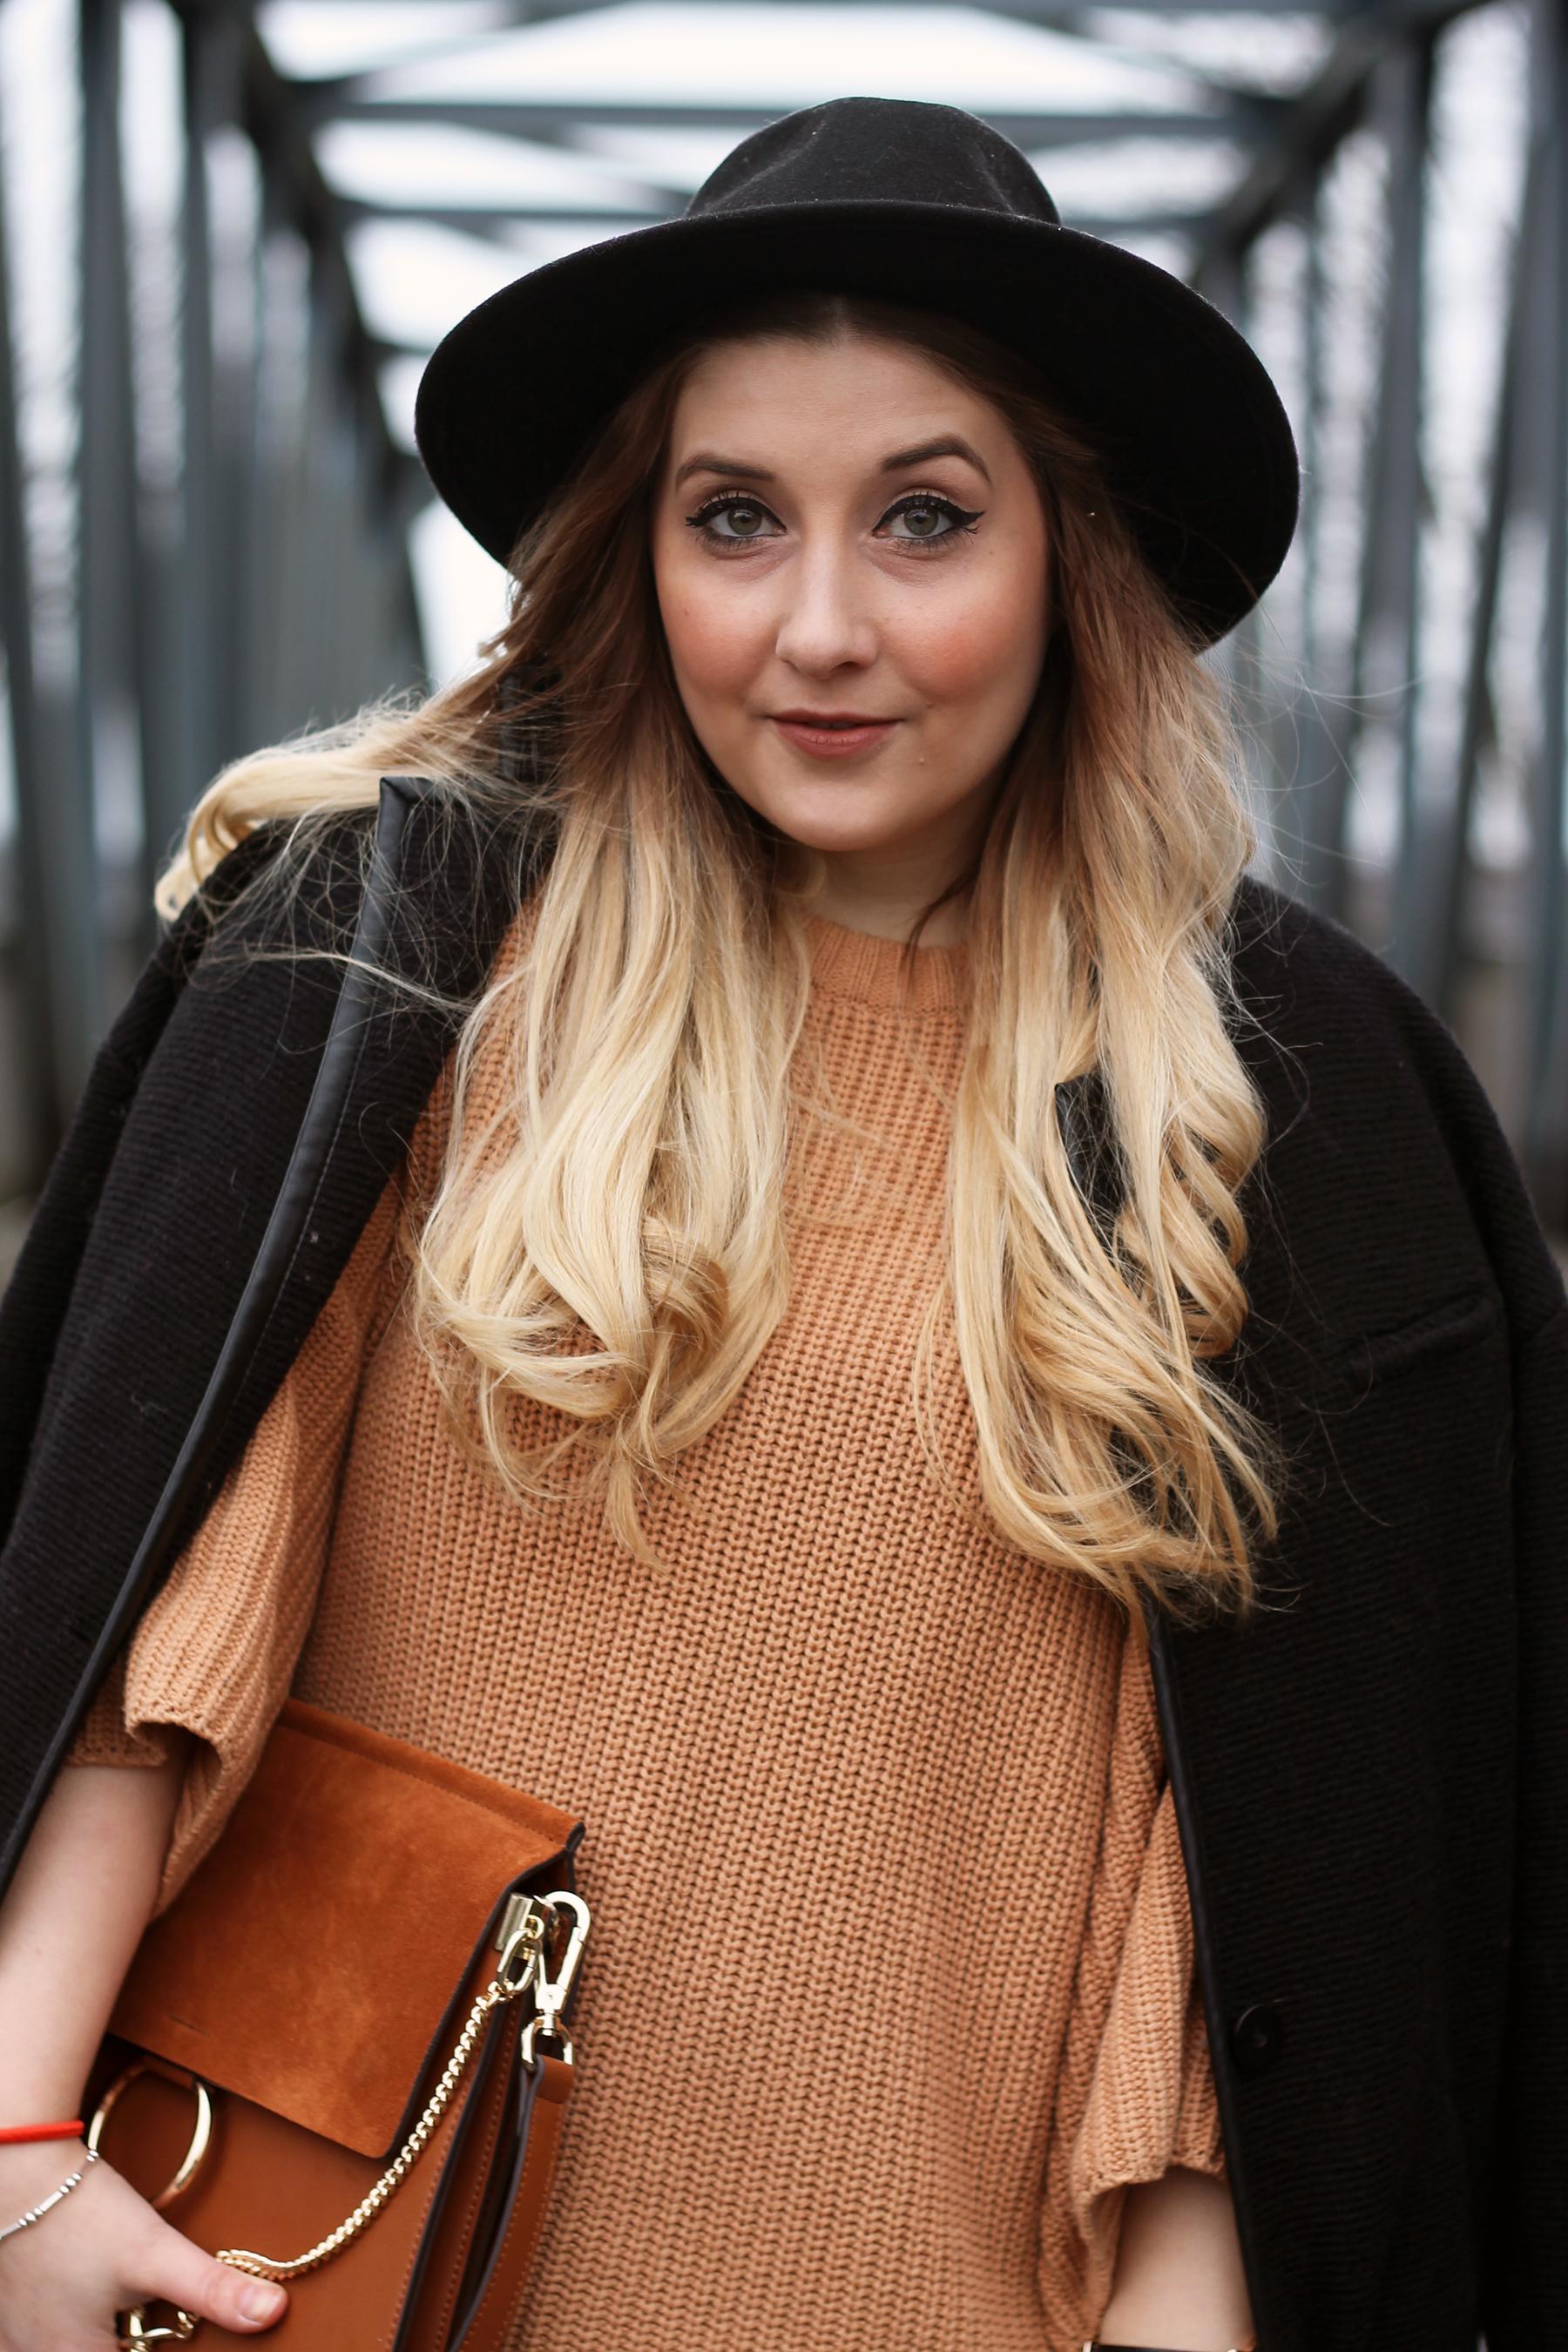 outfit-look-style-streetstyle-blog-modeblog-fashionblog-deutschland-berlin